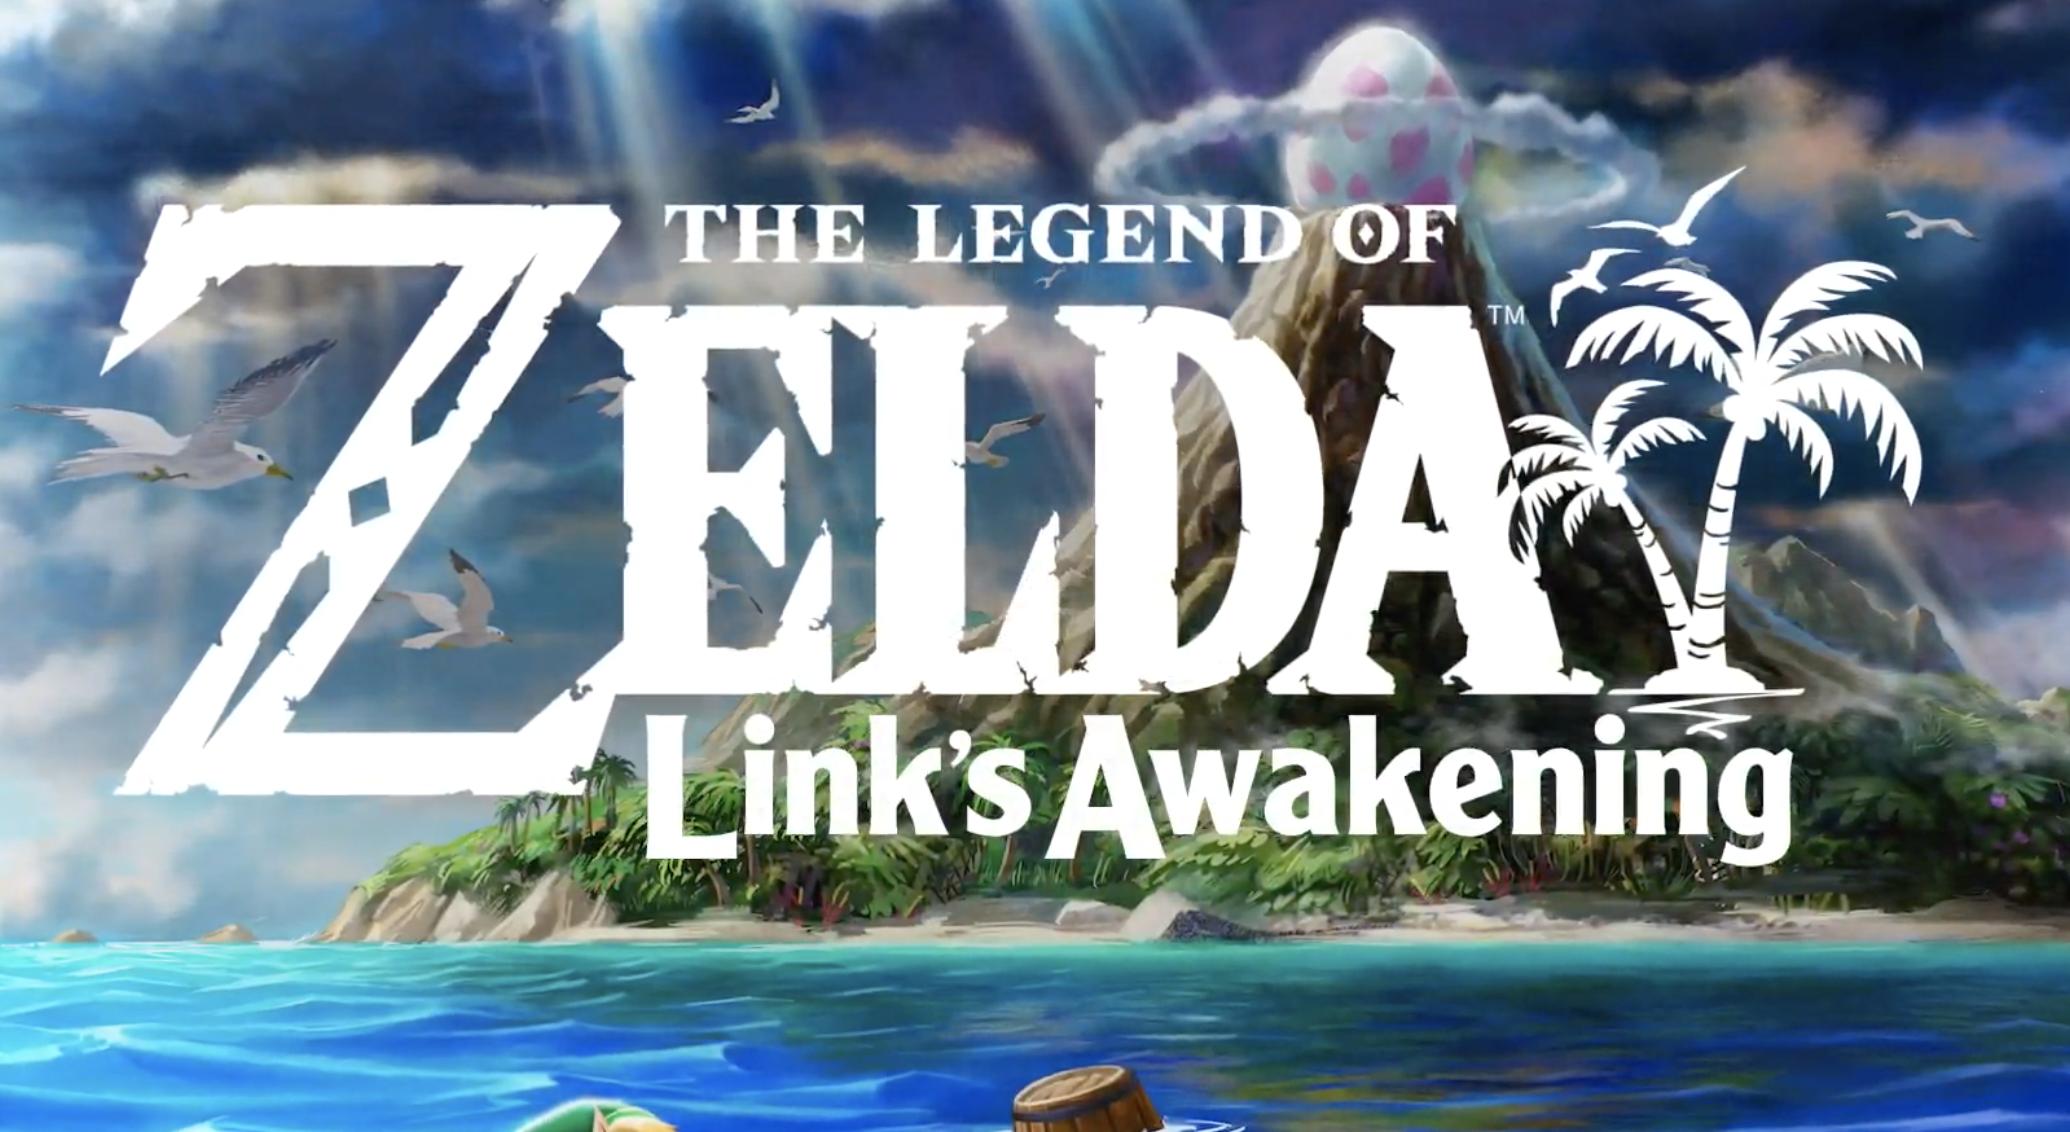 Links Awakening